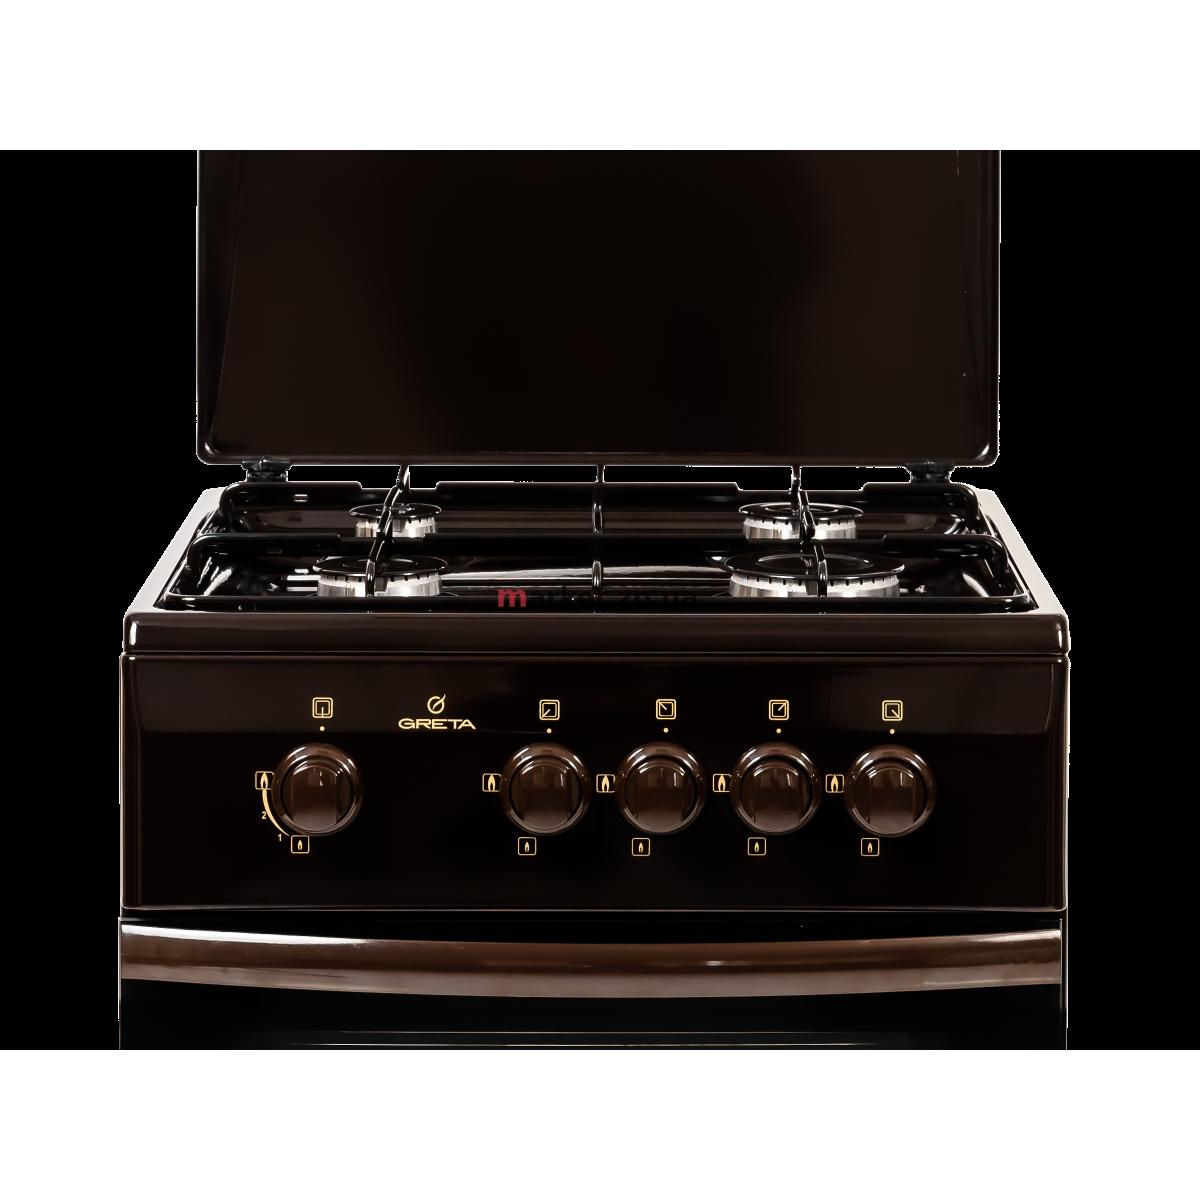 Плита GRETA 1470-16 aa (B) коричневая